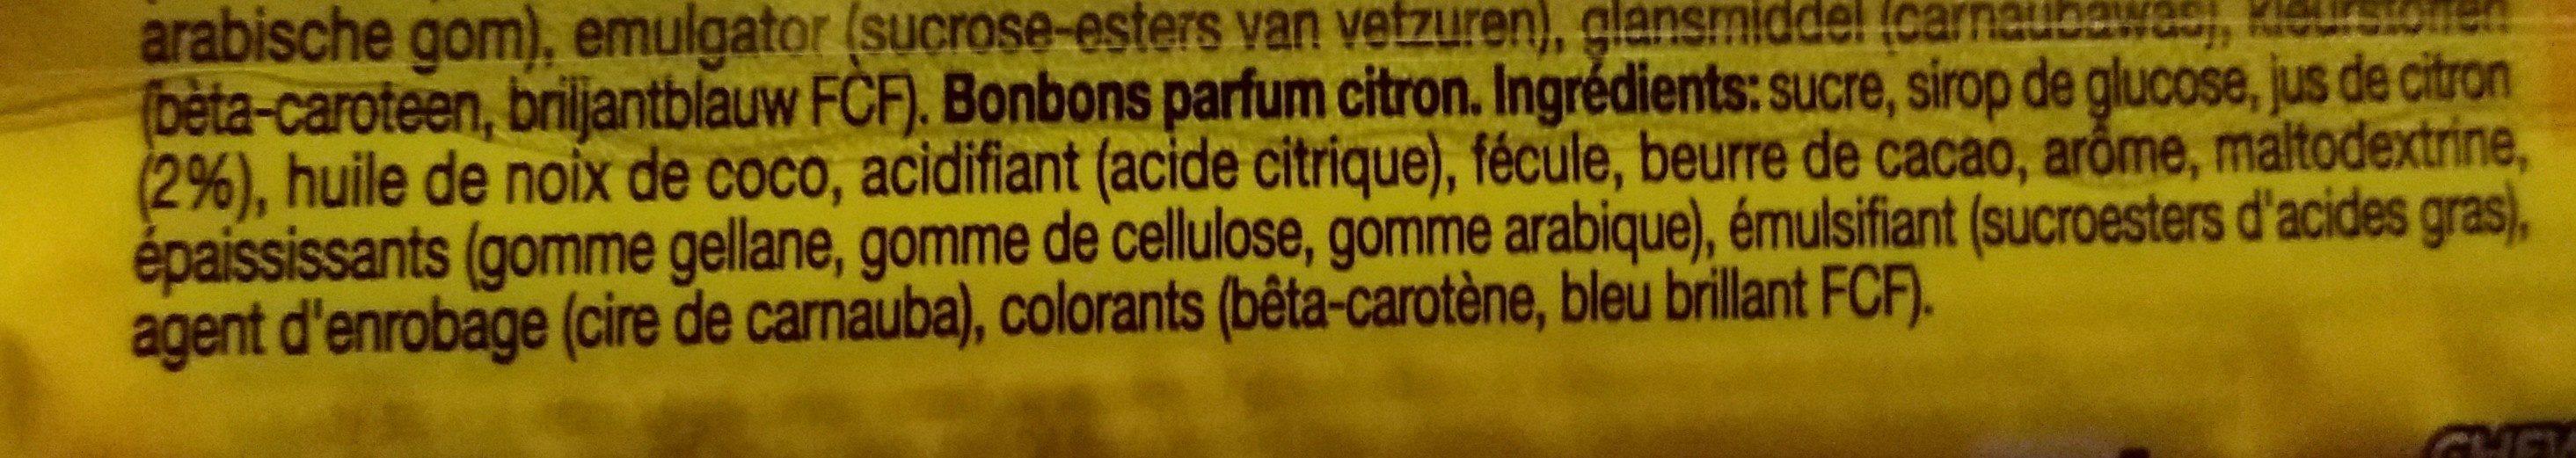 Mentos chewy dragees lemonade - Ingrédients - fr